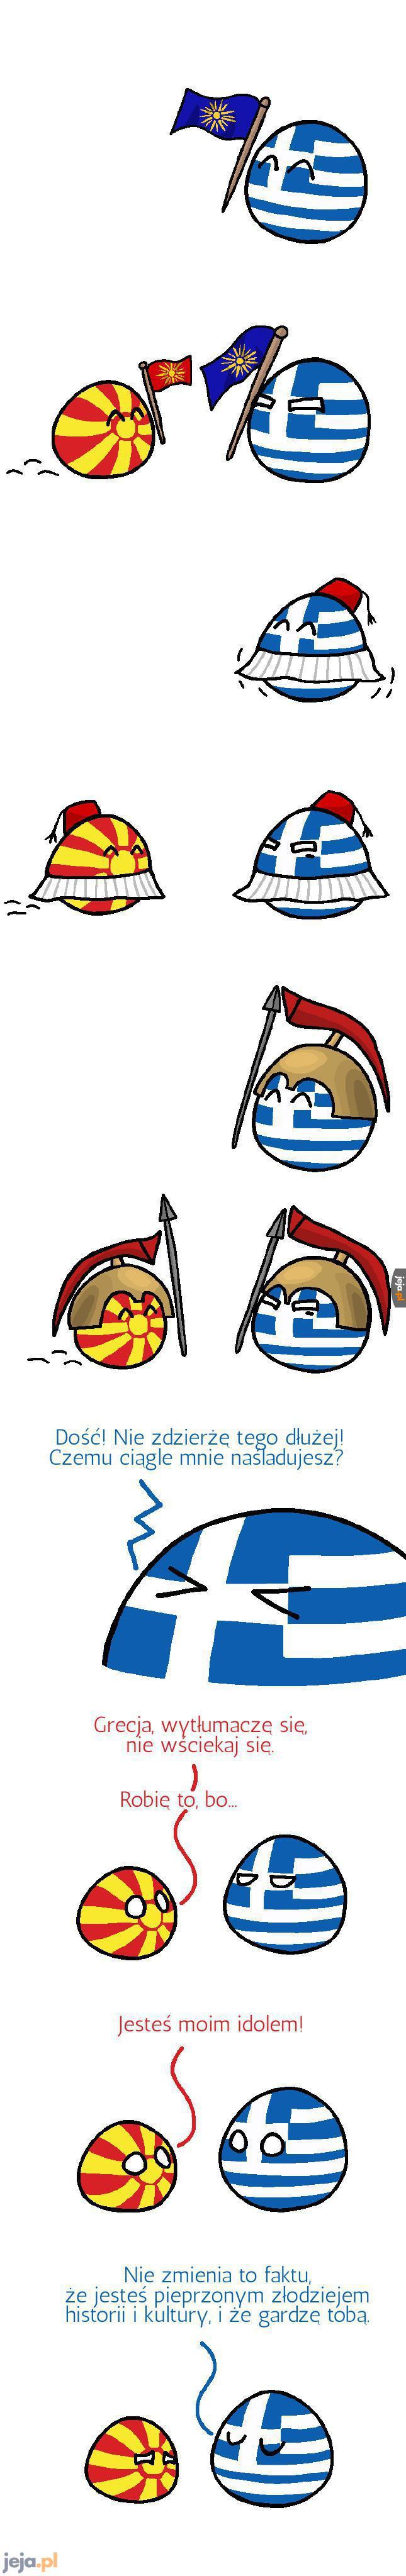 Historia Macedonii